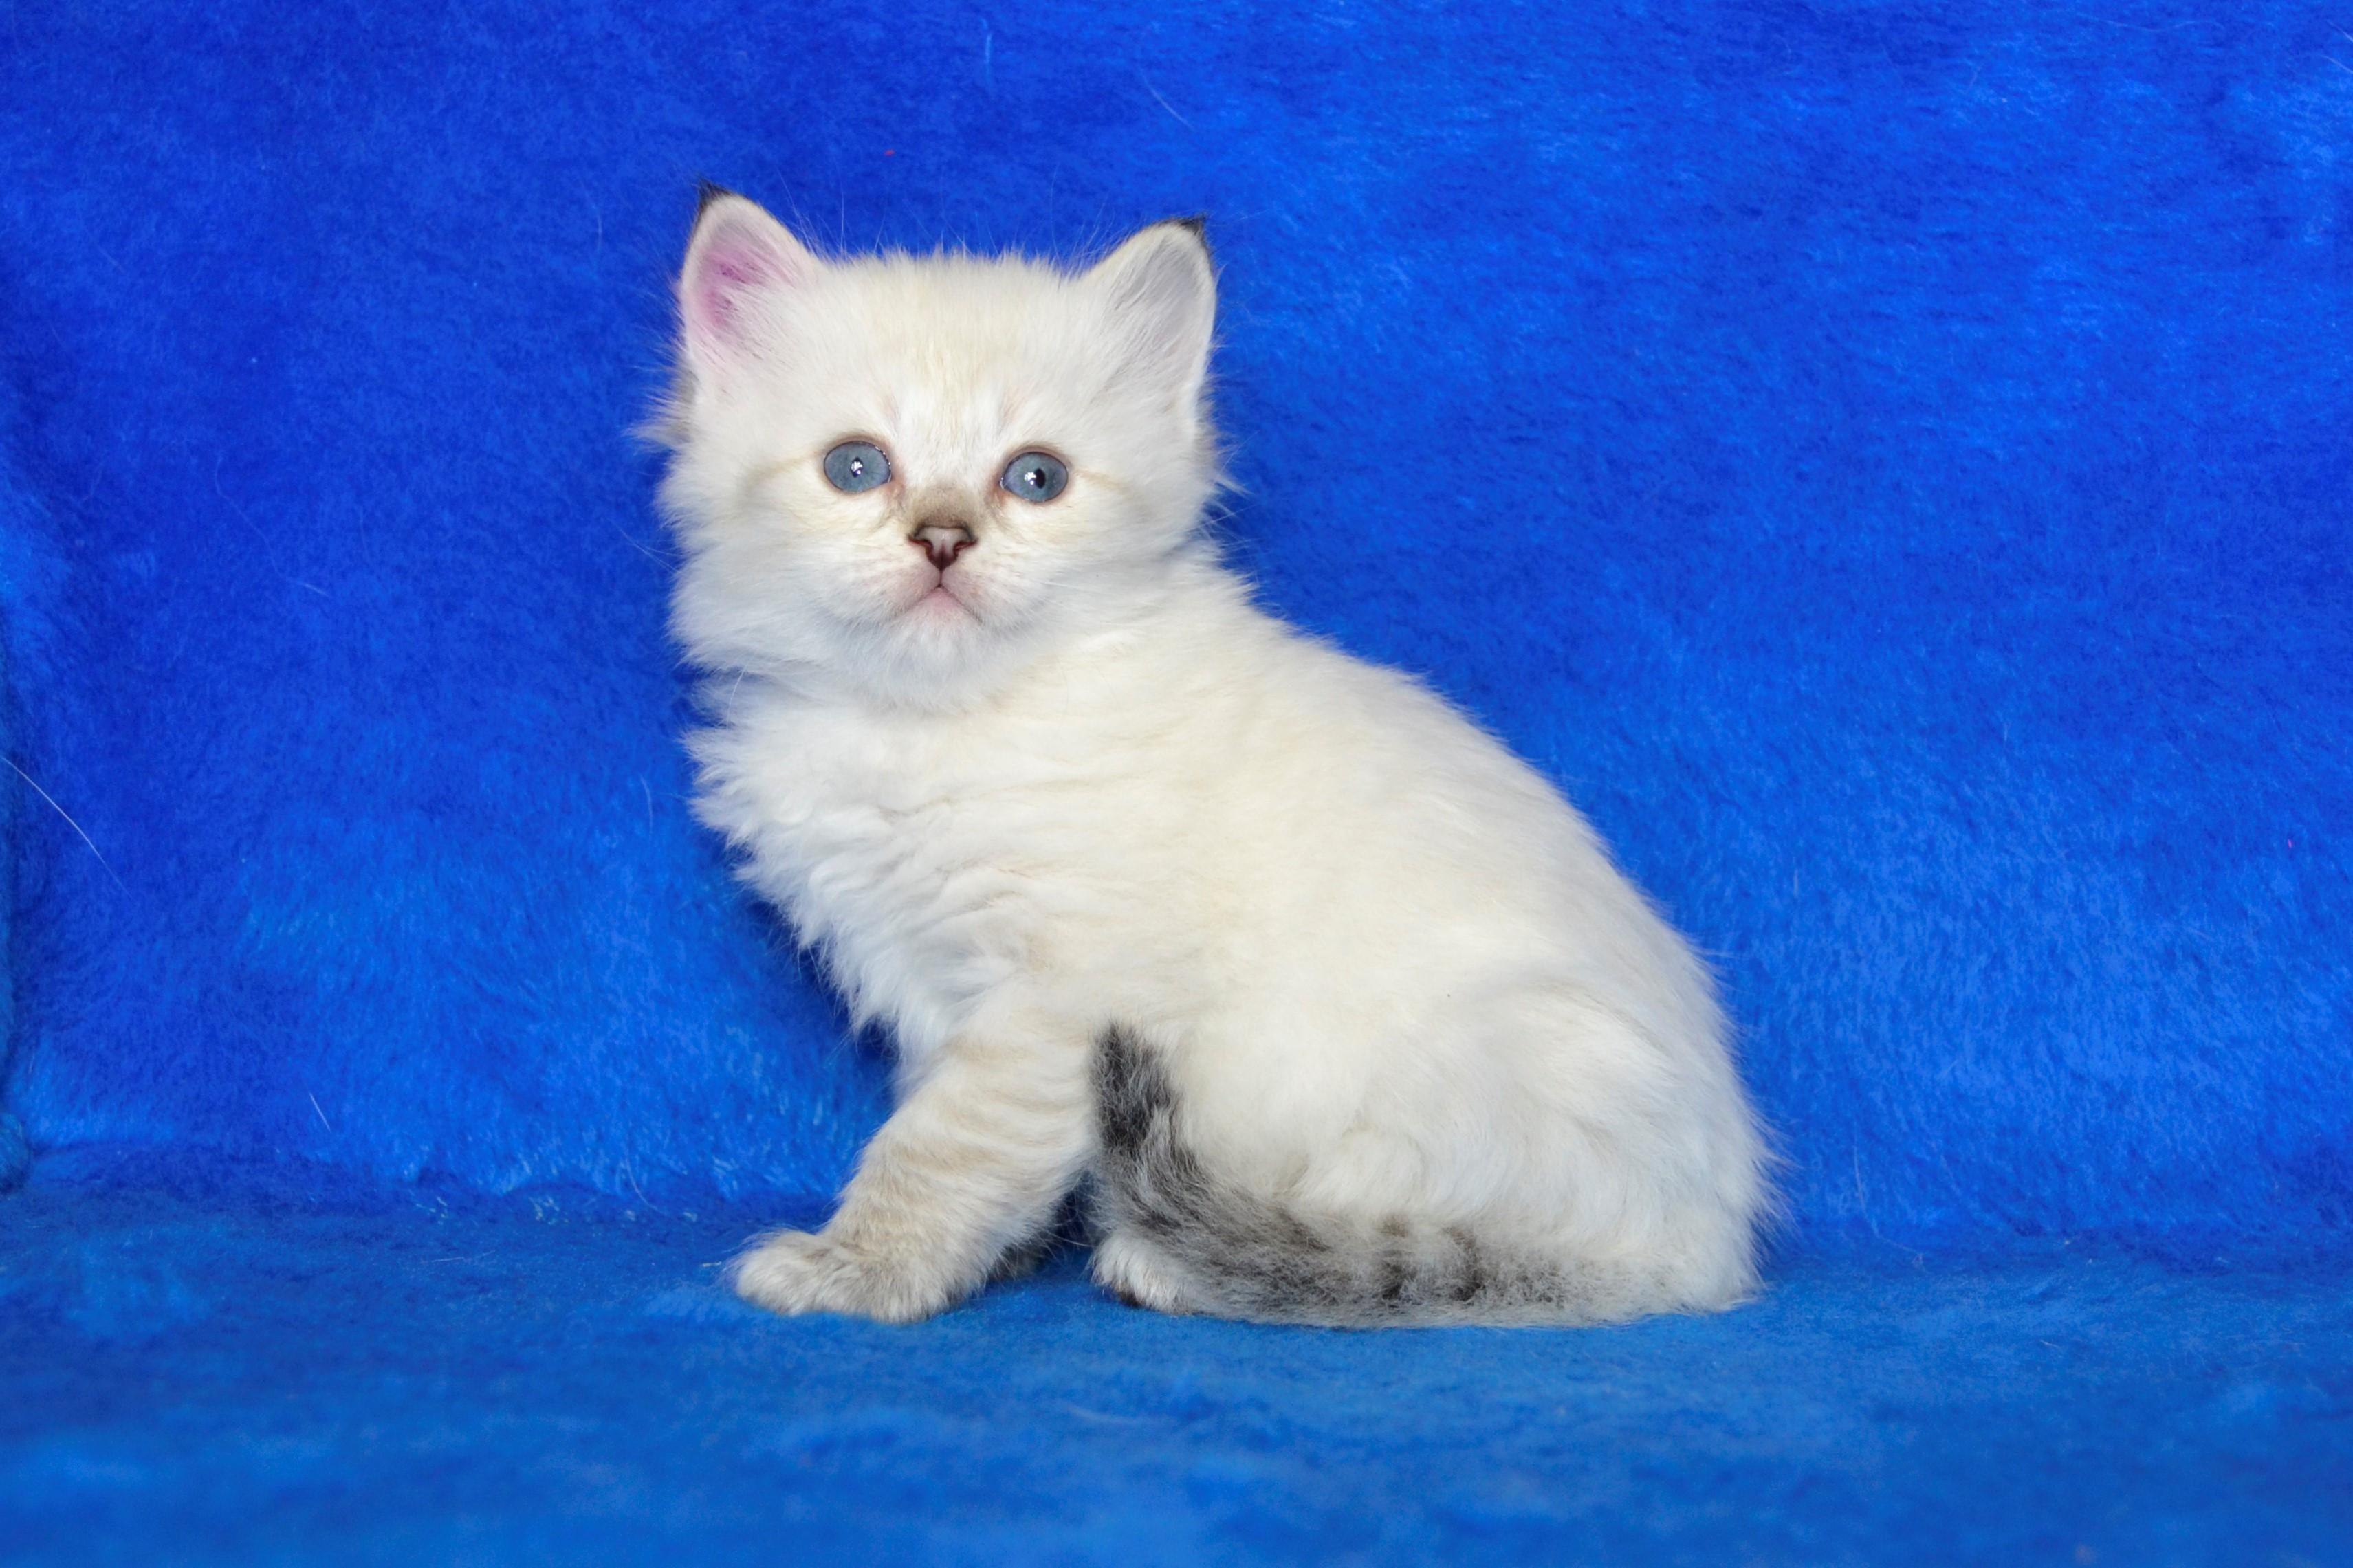 koty-syberyjskie-warszawa-miotv1